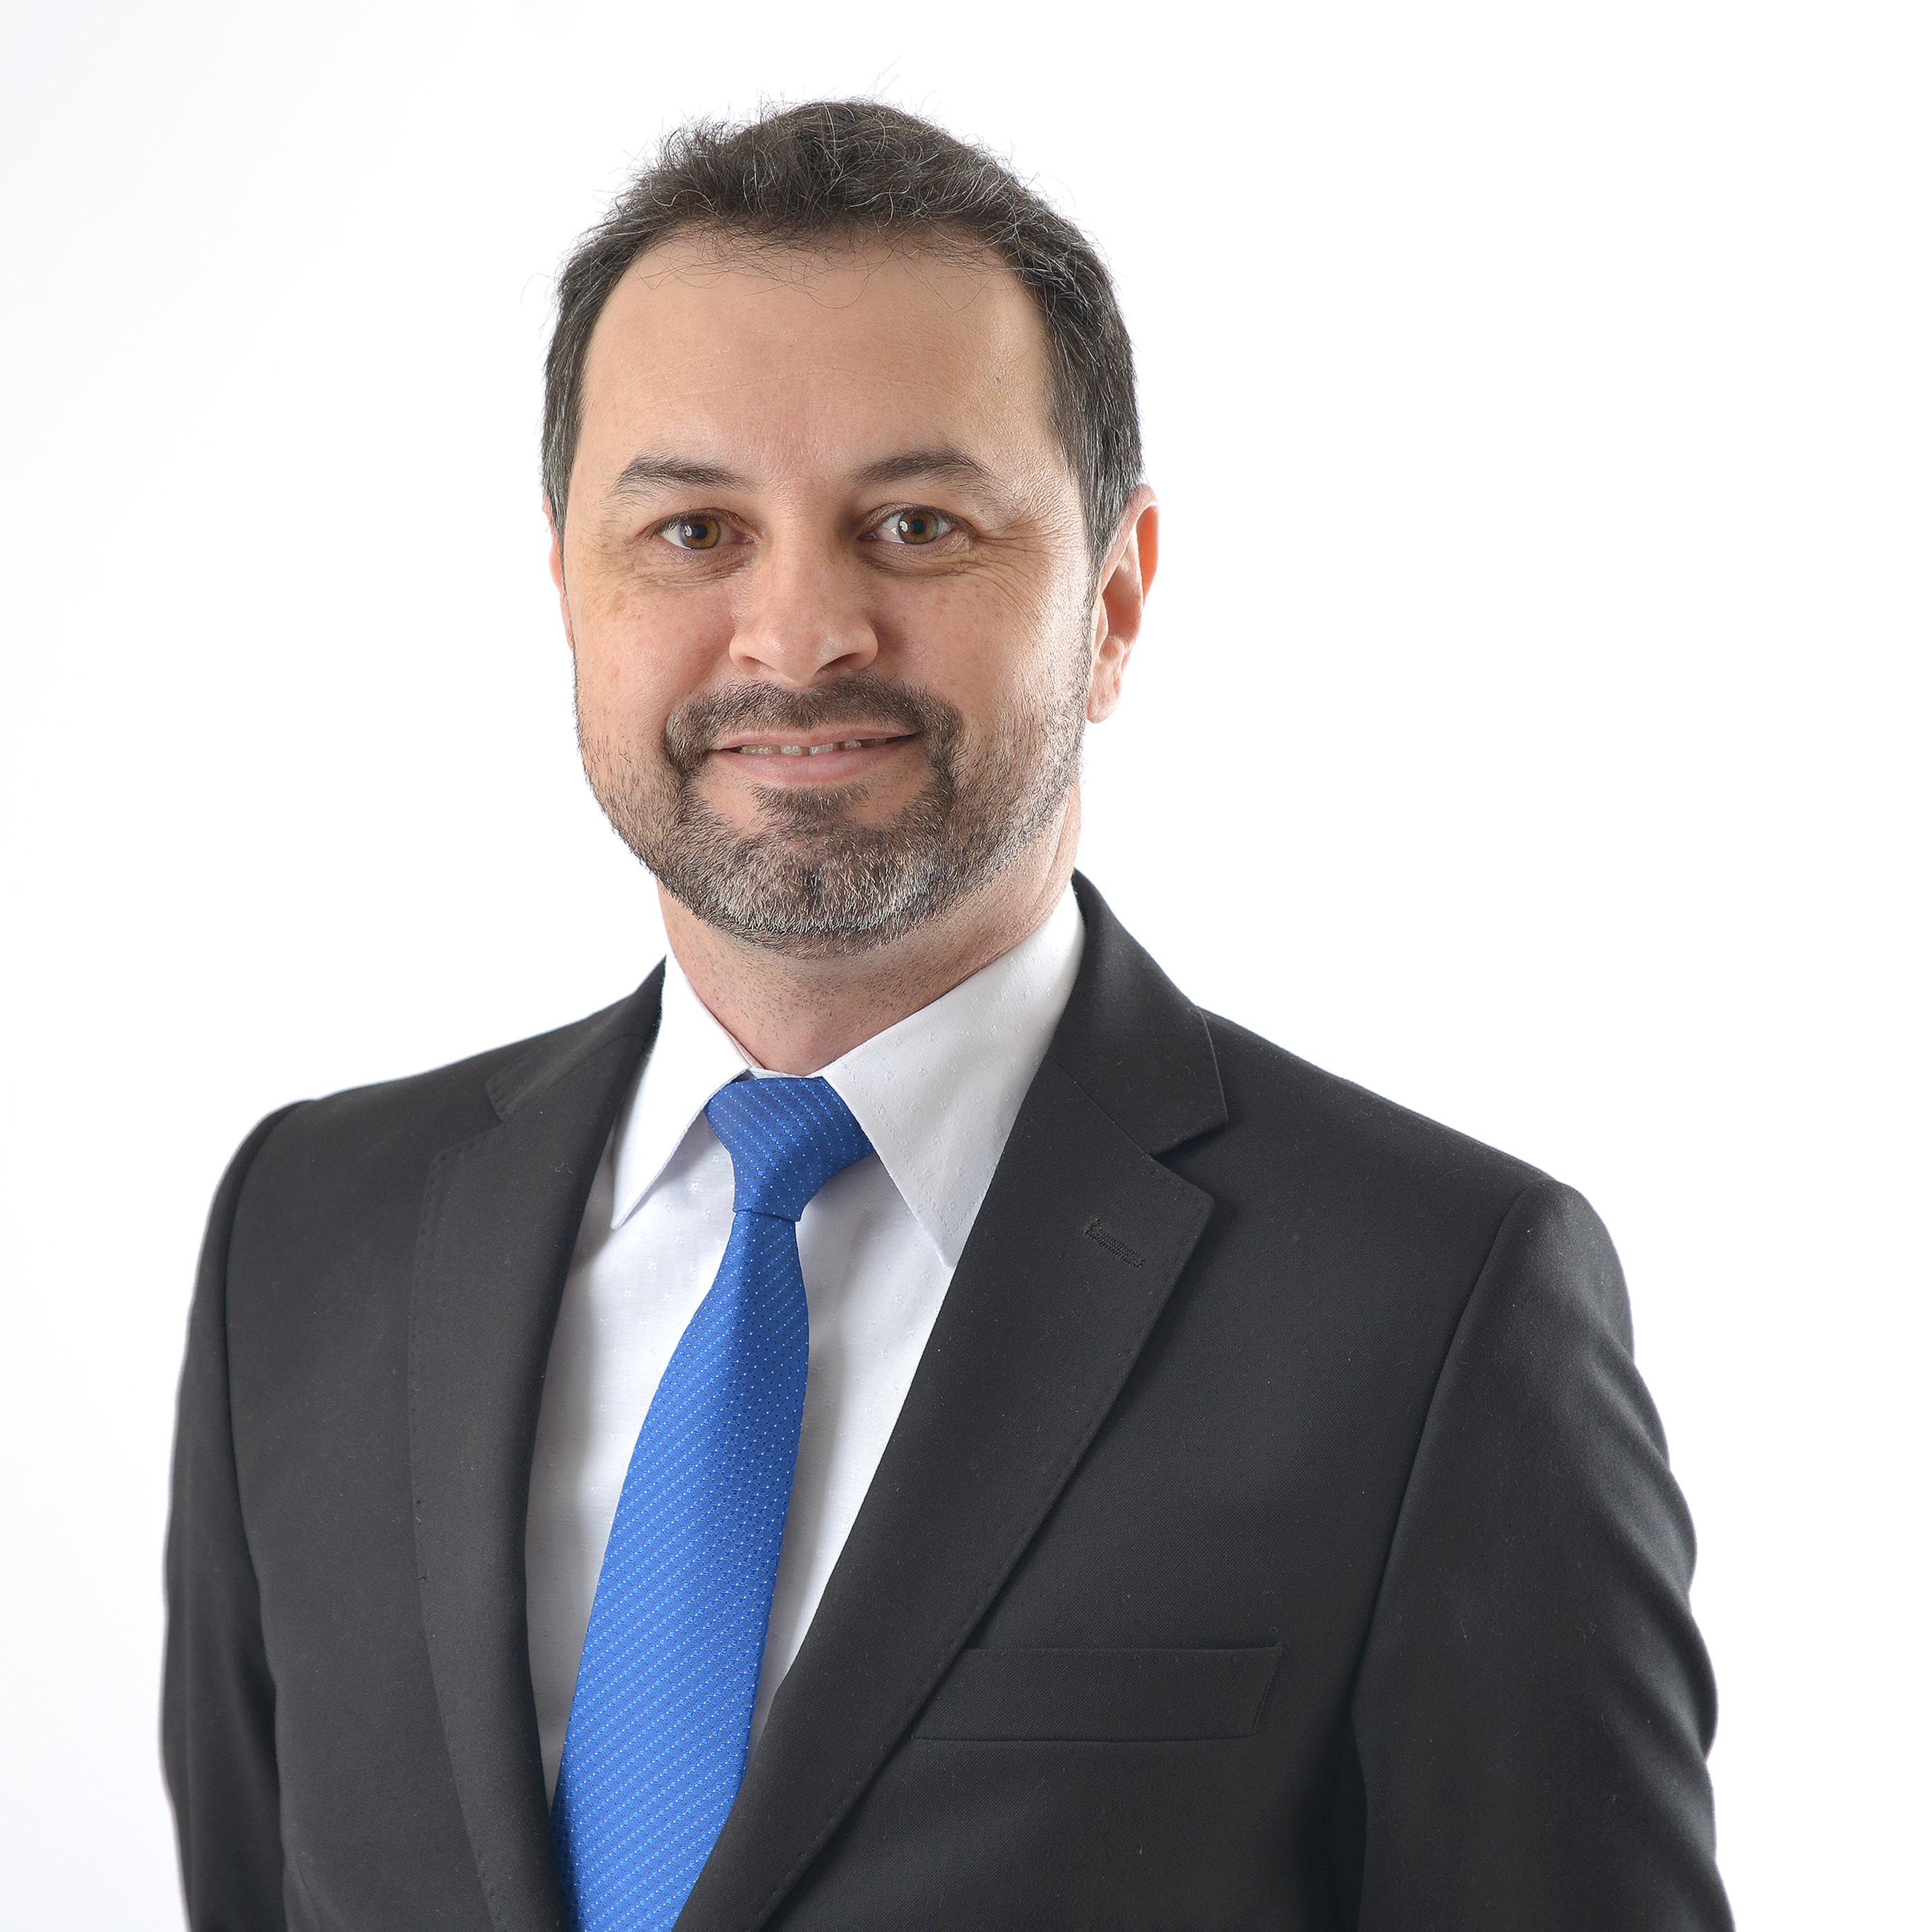 Douglas Adriano Pires